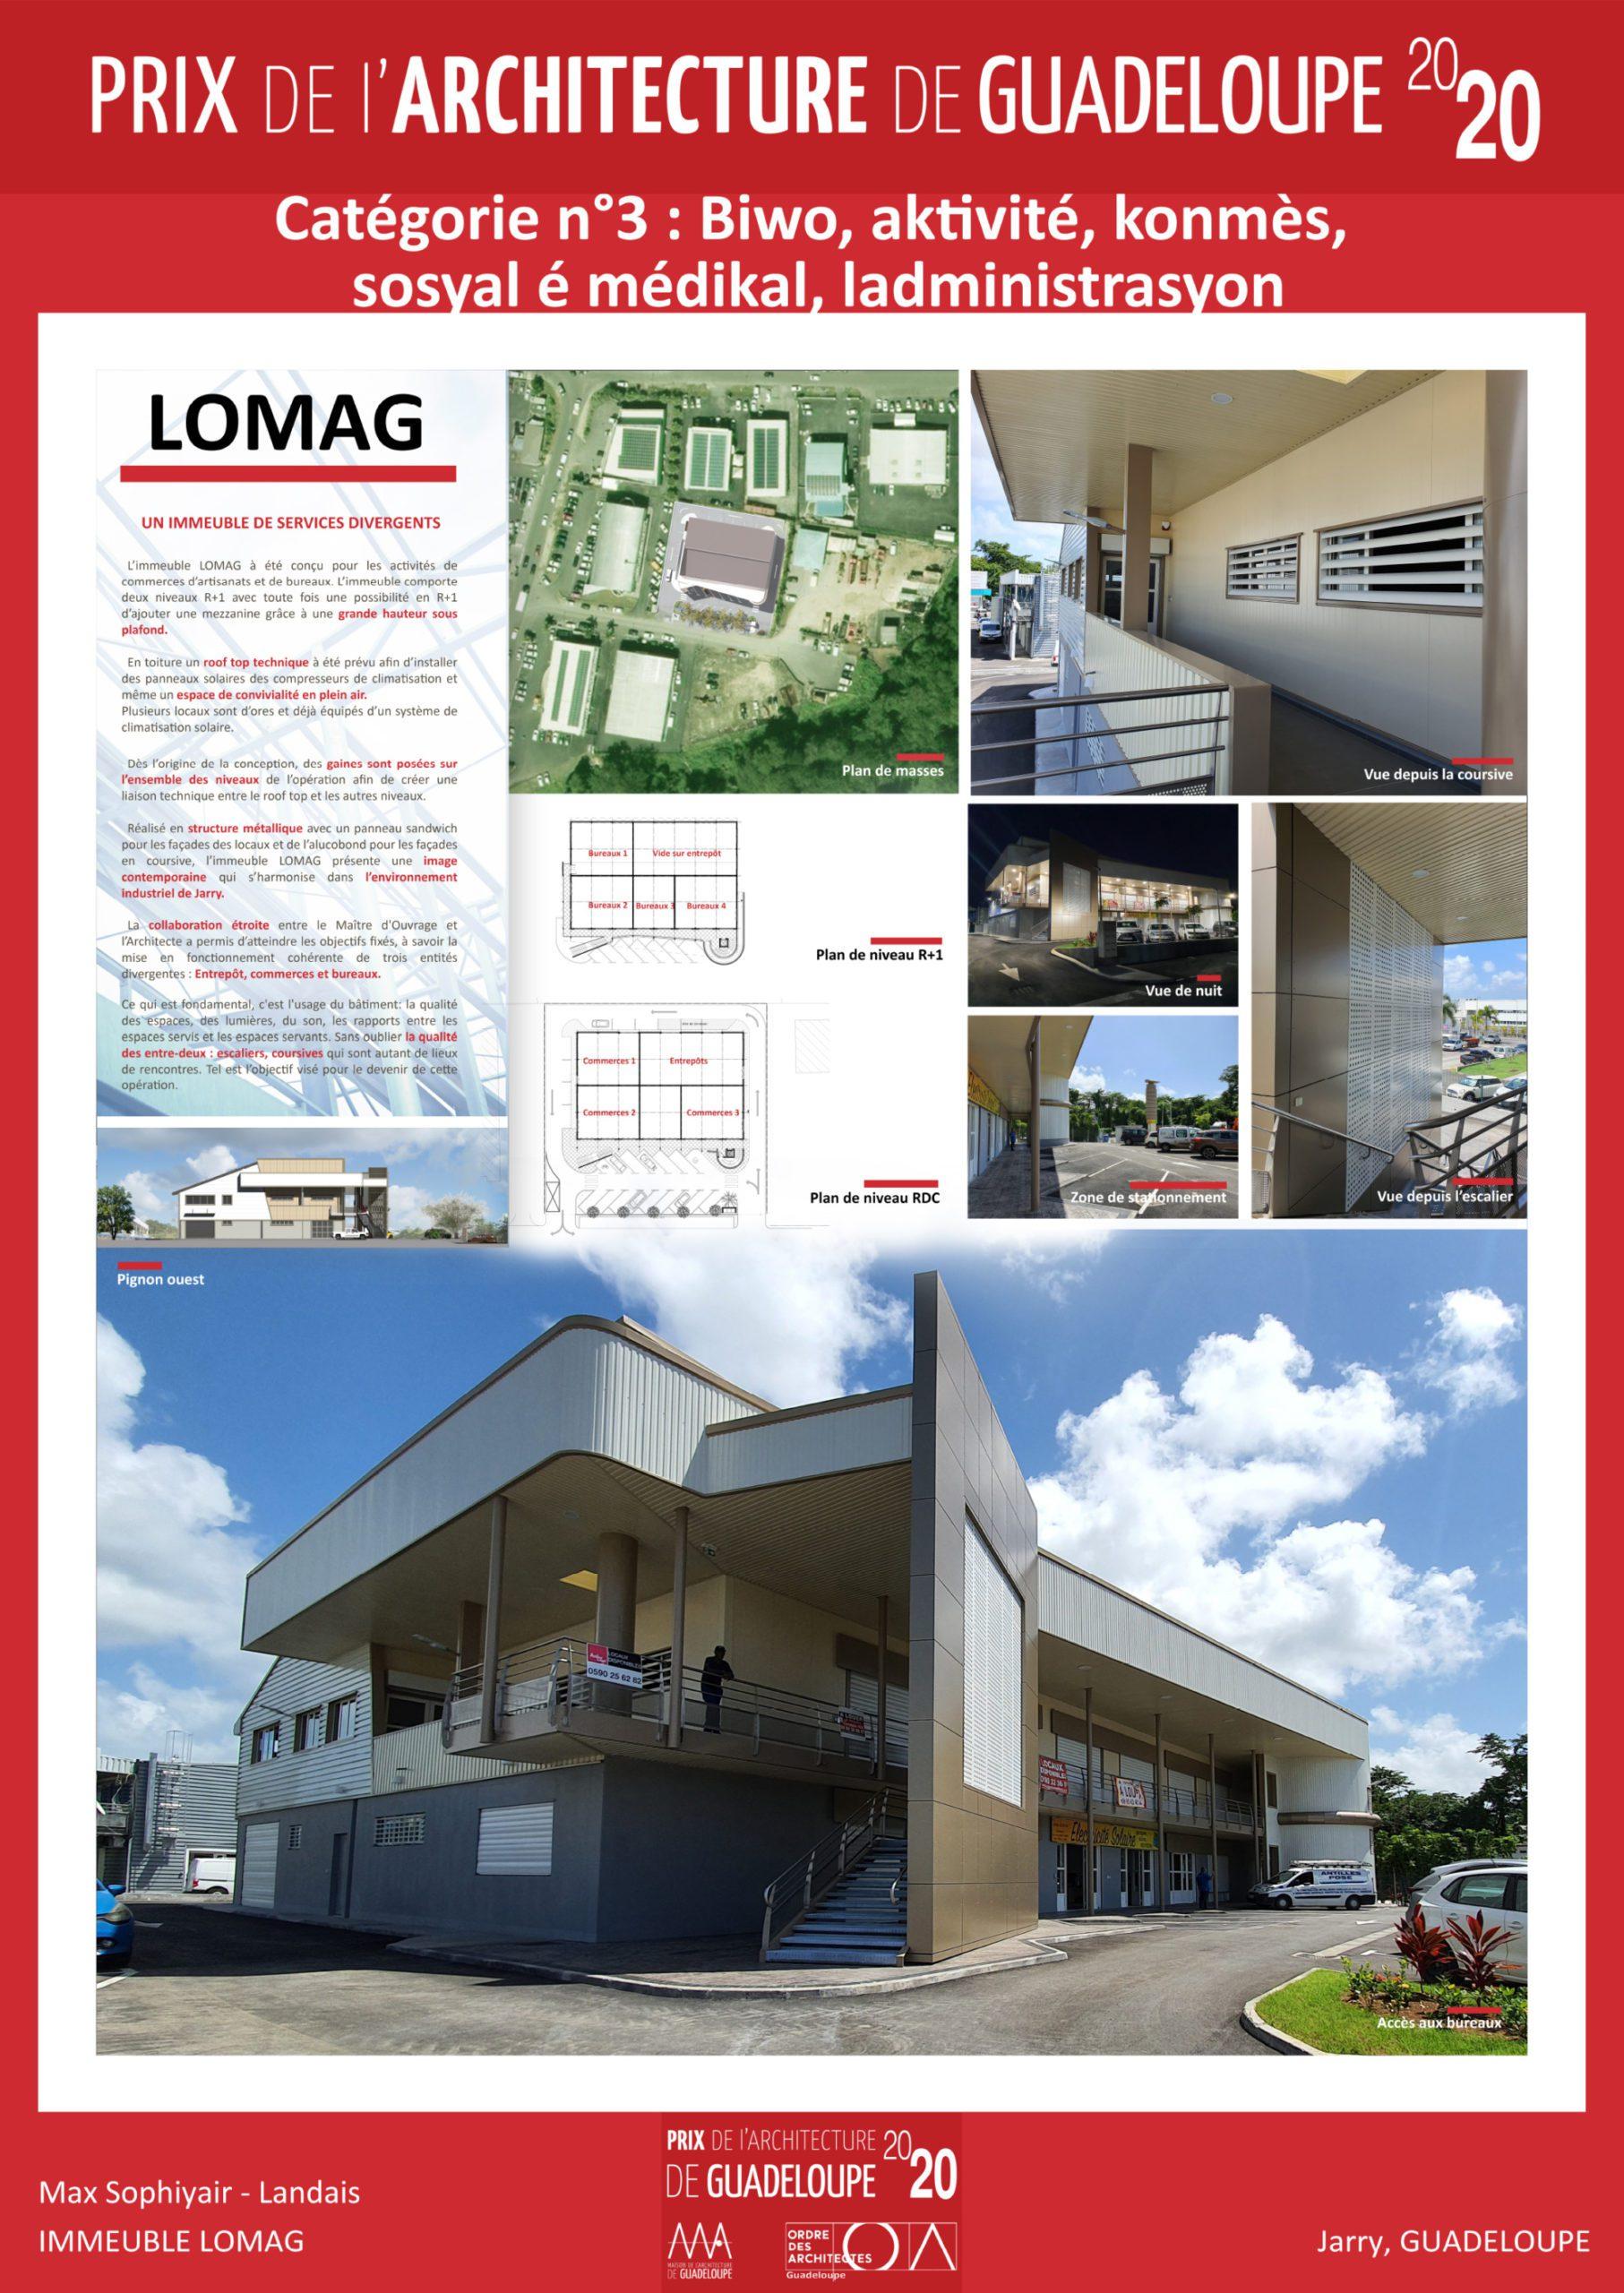 Immeuble LOMAG (Max Sophiyair-Landais)